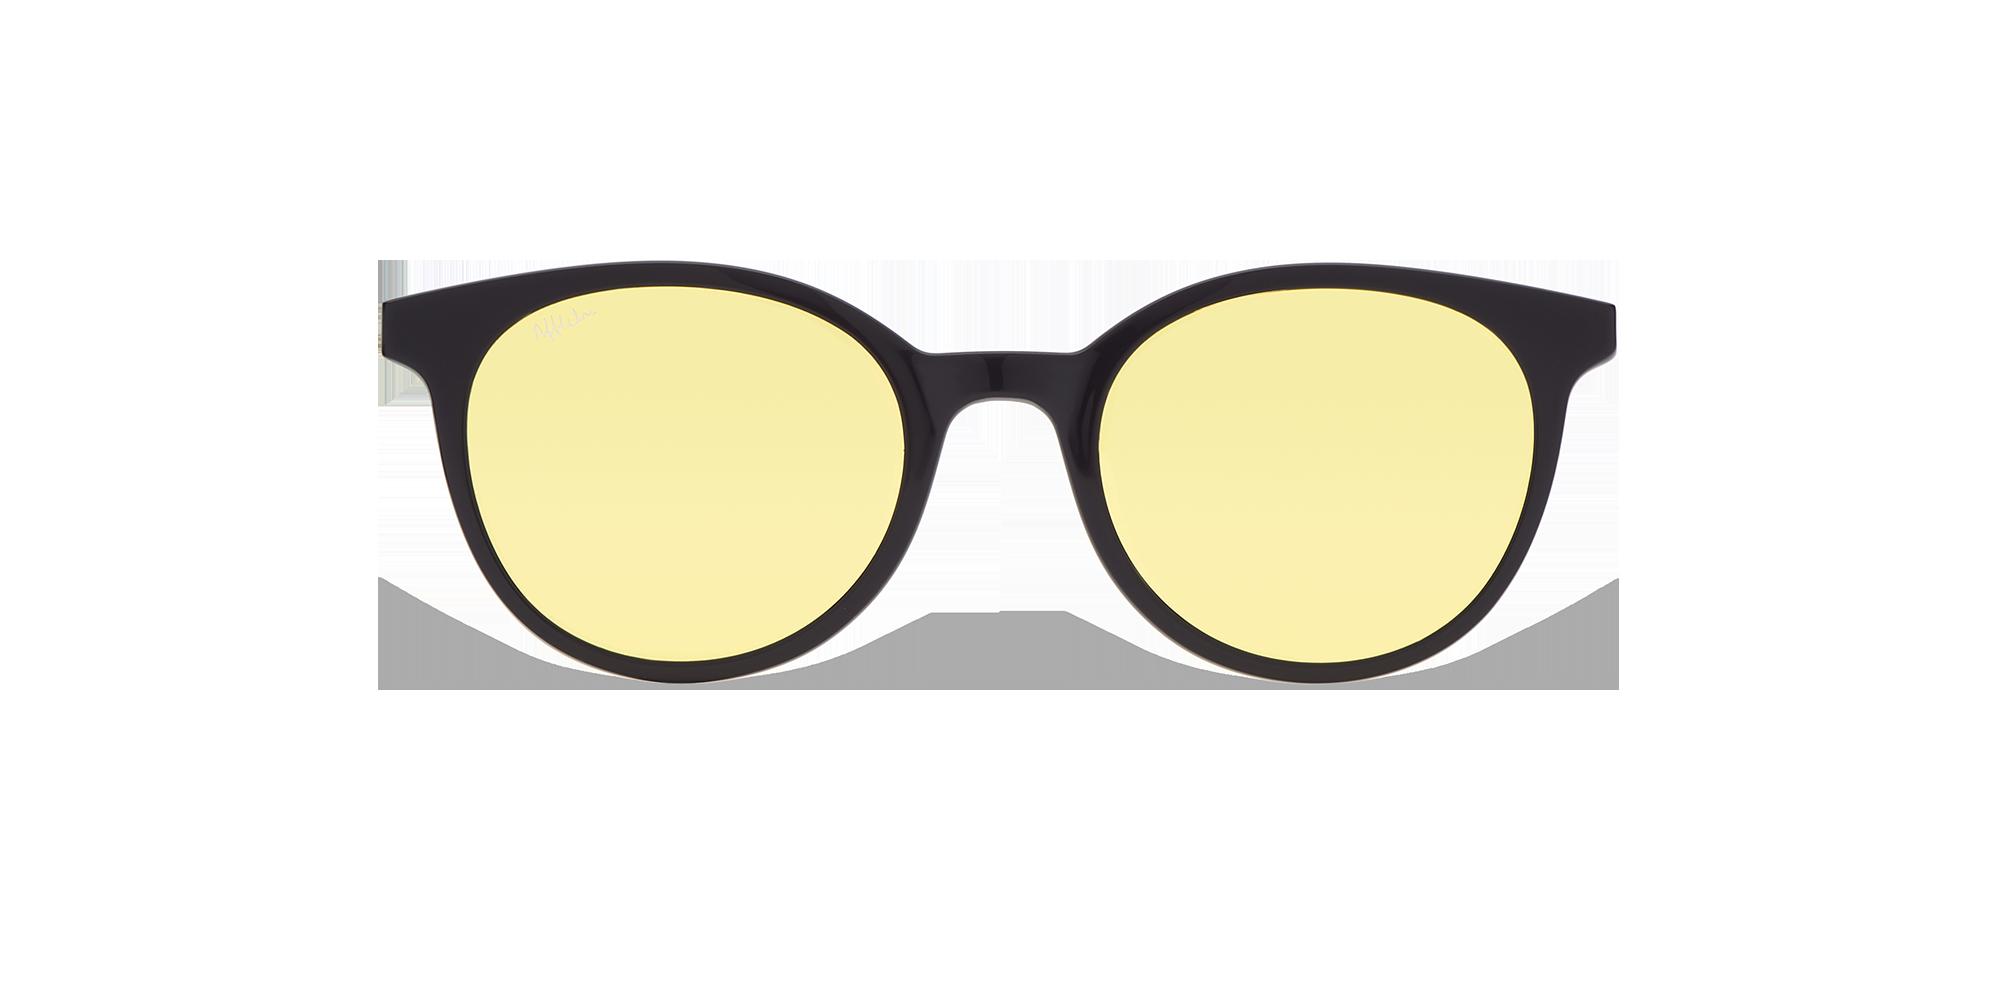 afflelou/france/products/smart_clip/clips_glasses/TMK36YEPU014819.png